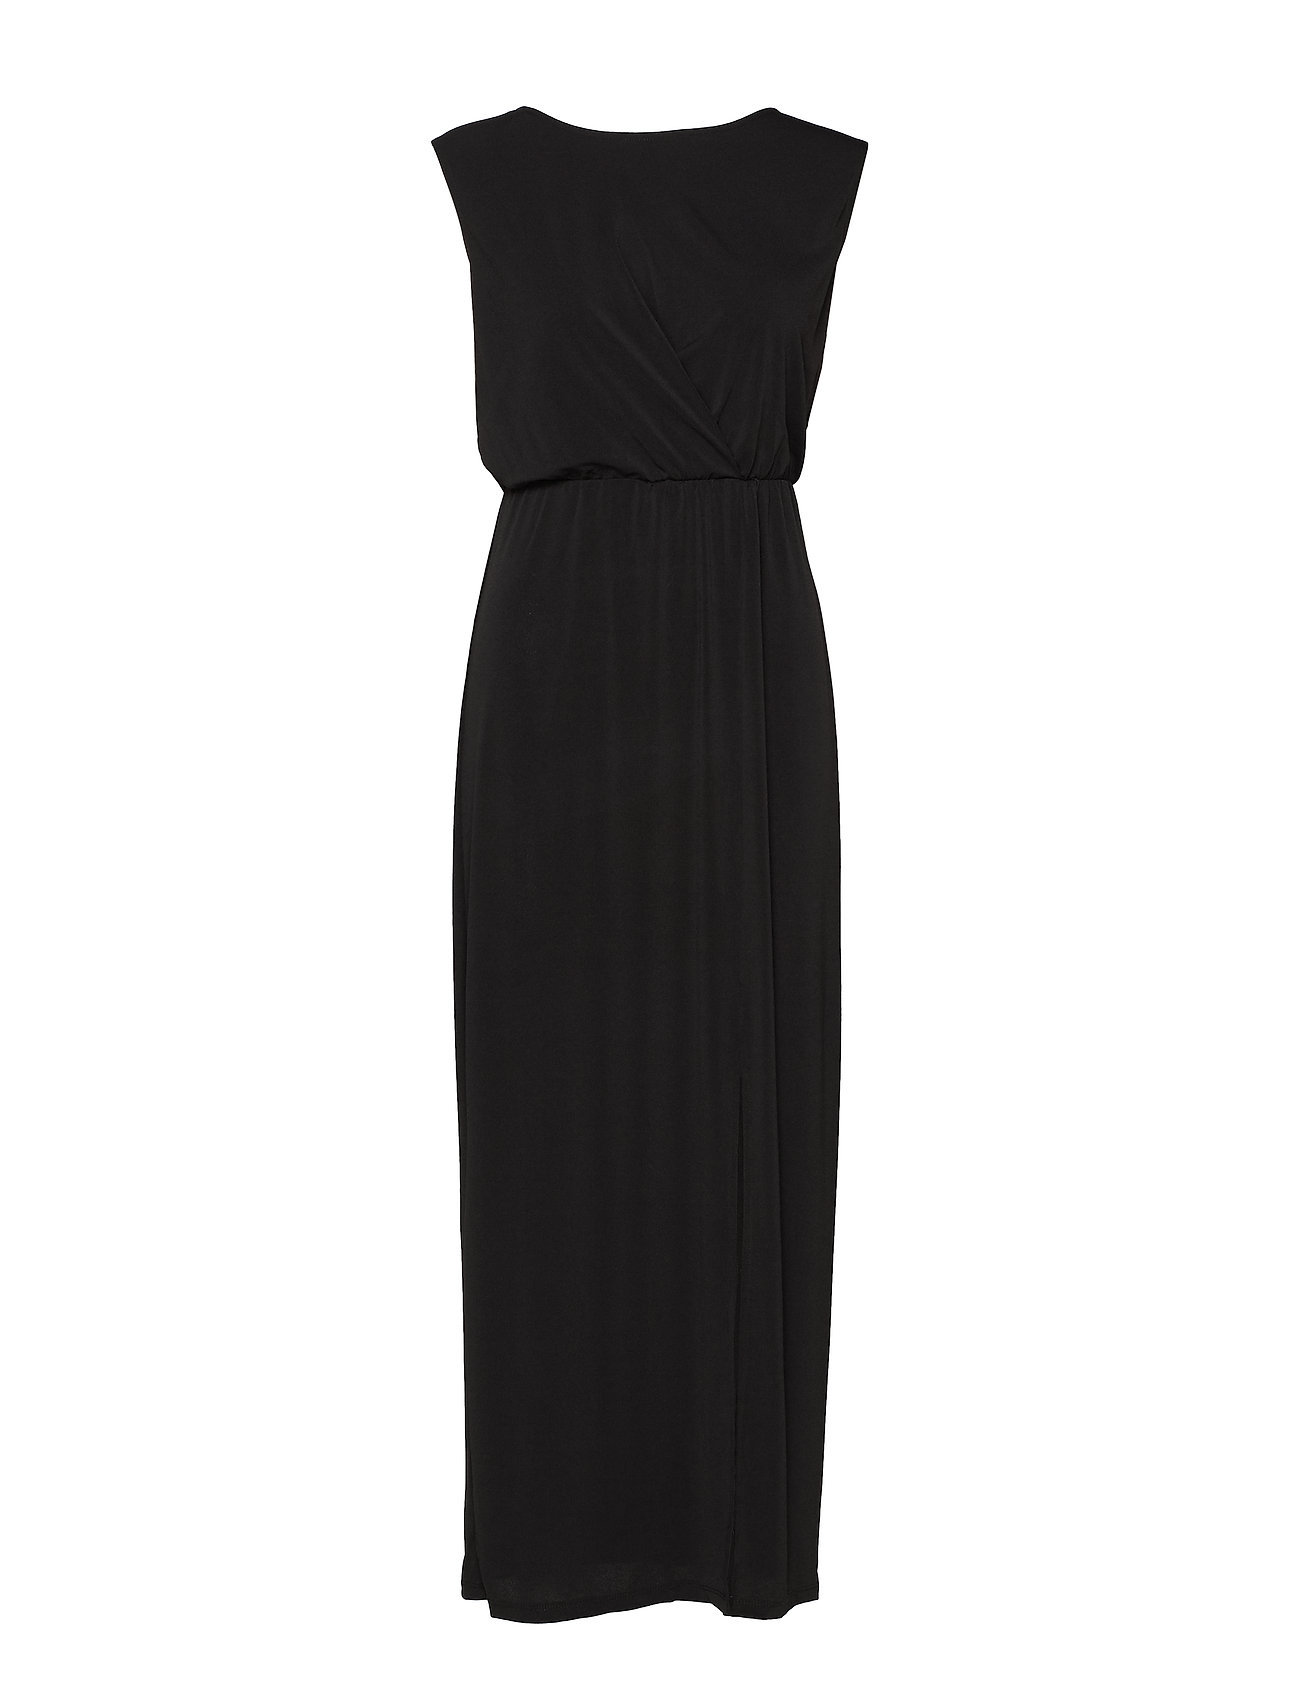 Vila VICLASSY MAXI DRESS - FAV NX - BLACK